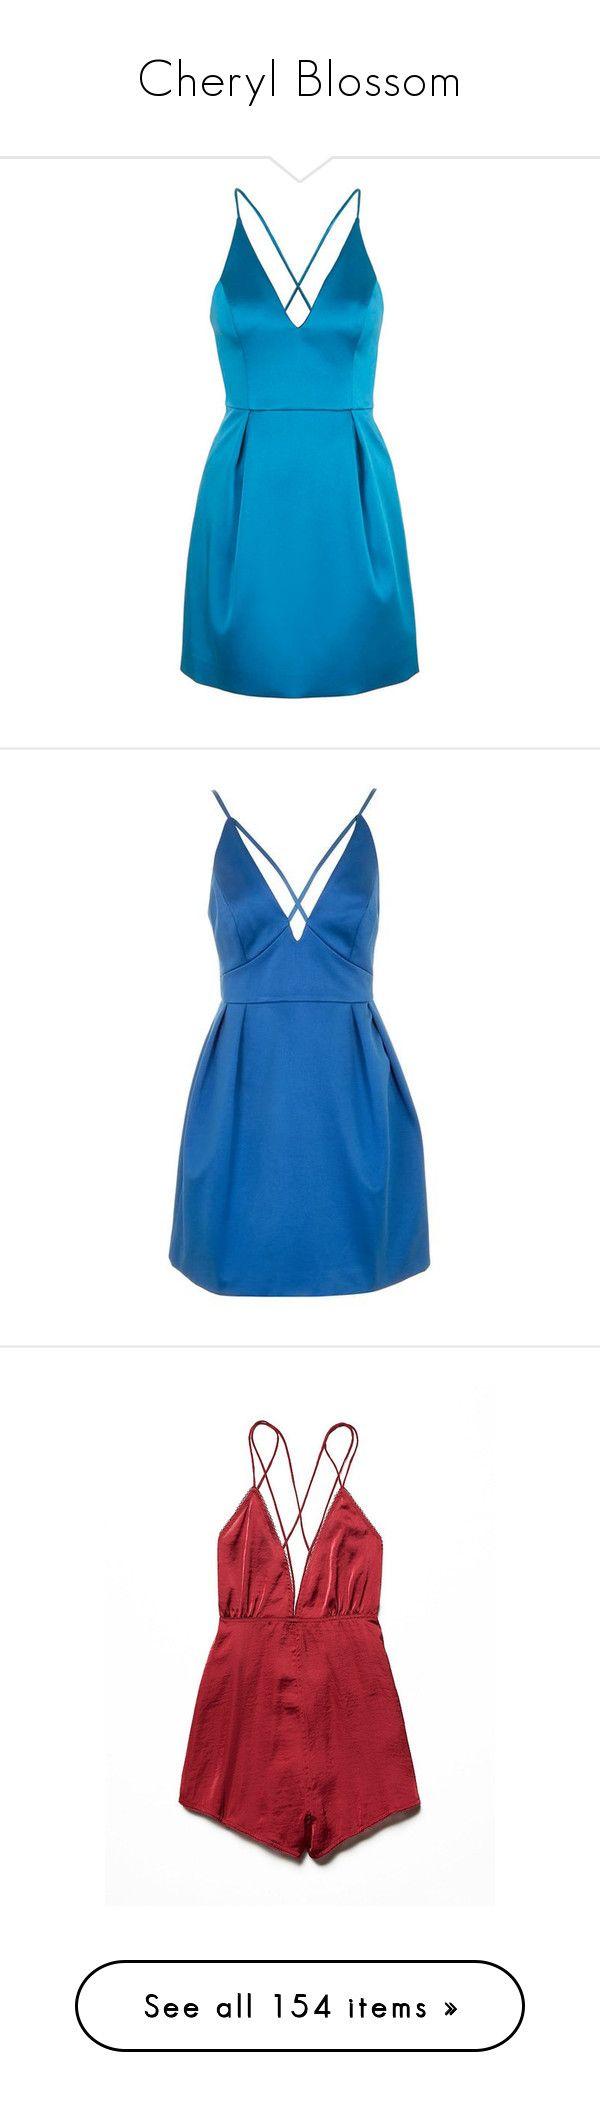 """Cheryl Blossom"" by rebellious-ingenue ❤ liked on Polyvore featuring dresses, short dresses, blue, blue mini dress, v neck dress, blue a line dress, satin dress, formal cocktail dresses, blue prom dresses and formal dresses"